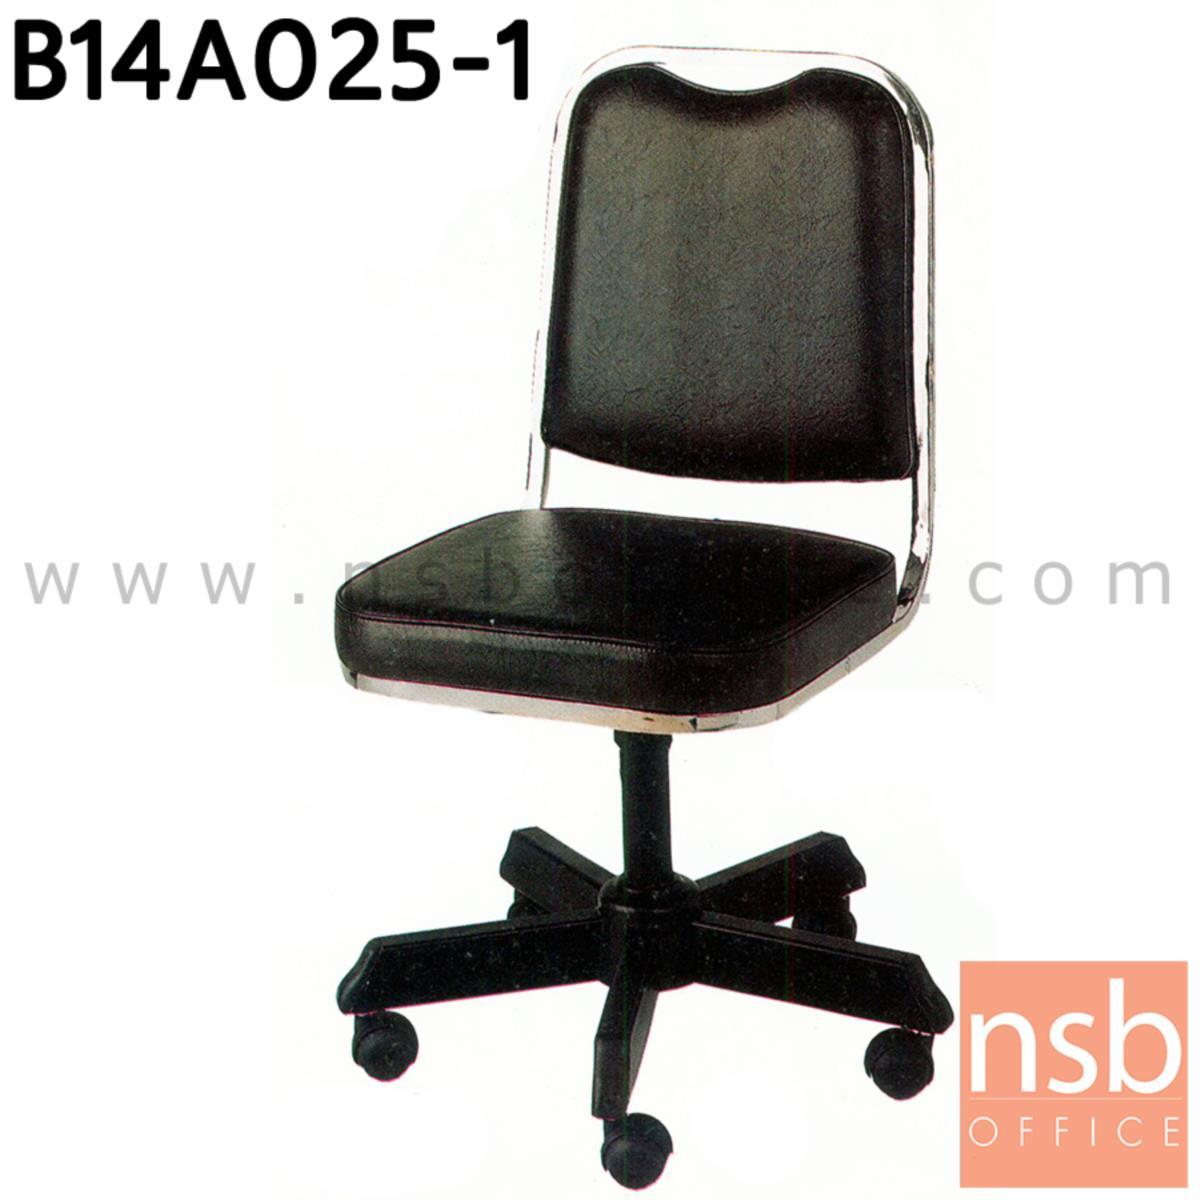 B14A025:เก้าอี้สำนักงาน รุ่น August  ไม่มีท้าวแขน ขาเหล็ก 10 ล้อ